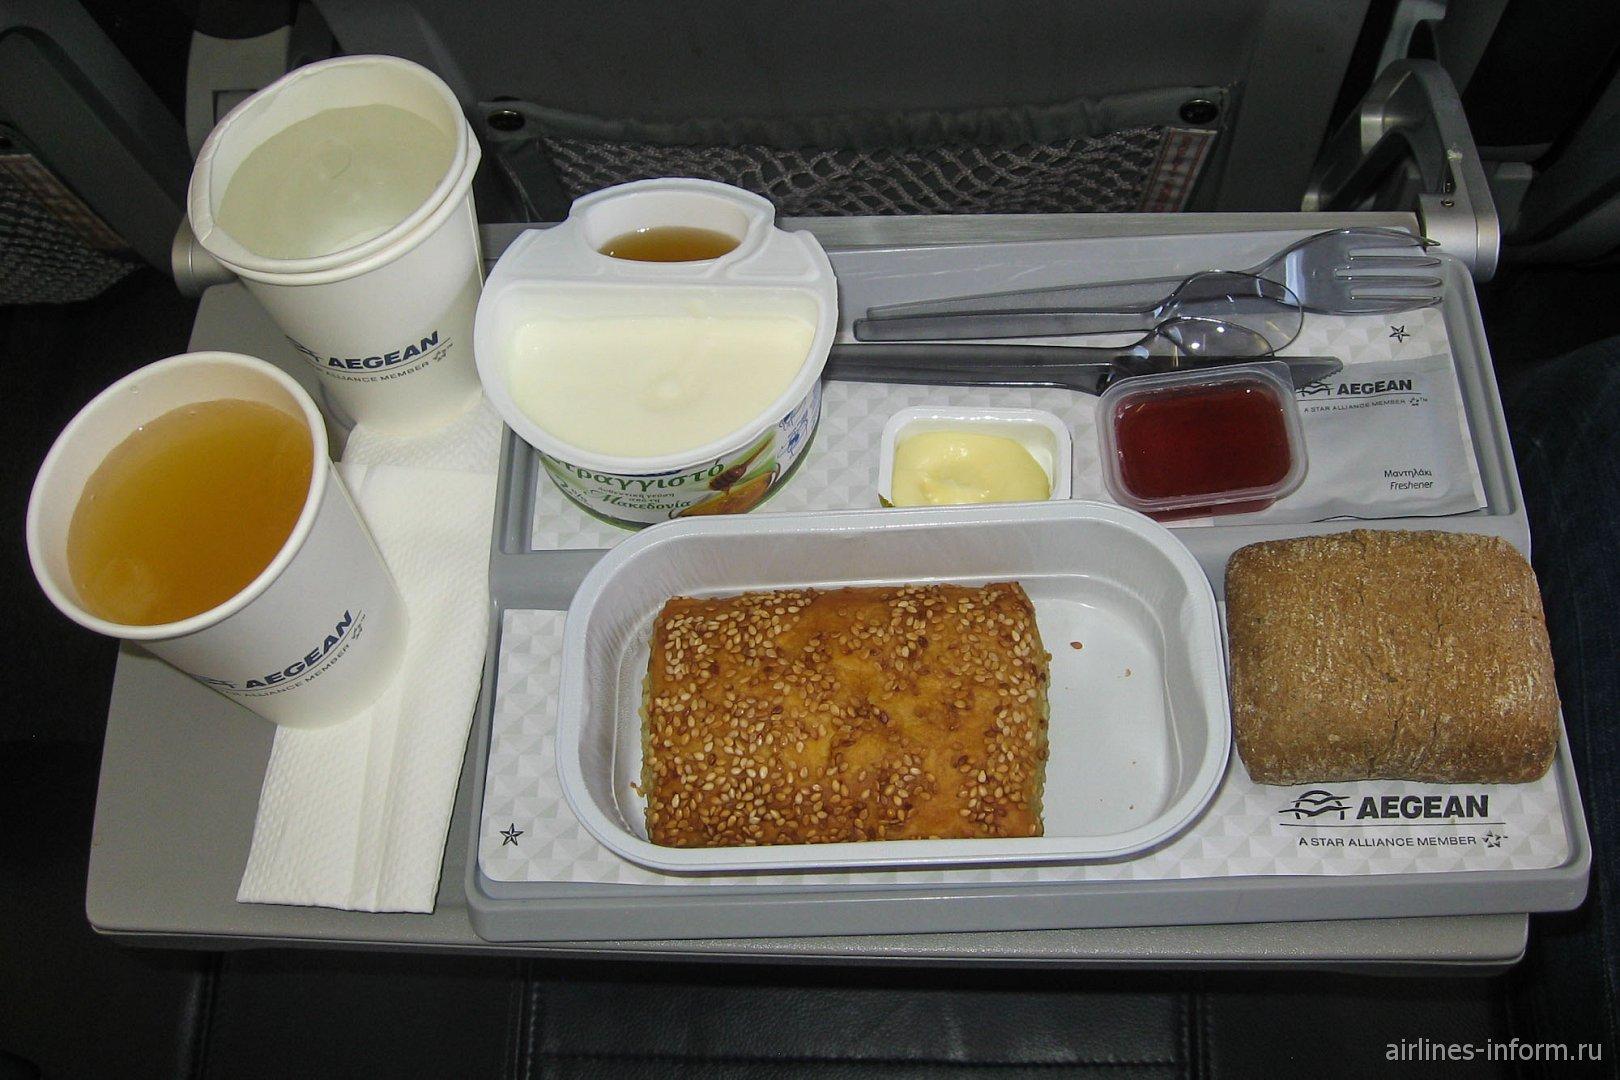 Бортовое питание на рейсе Салоники-Париж Эгейских авиалиний